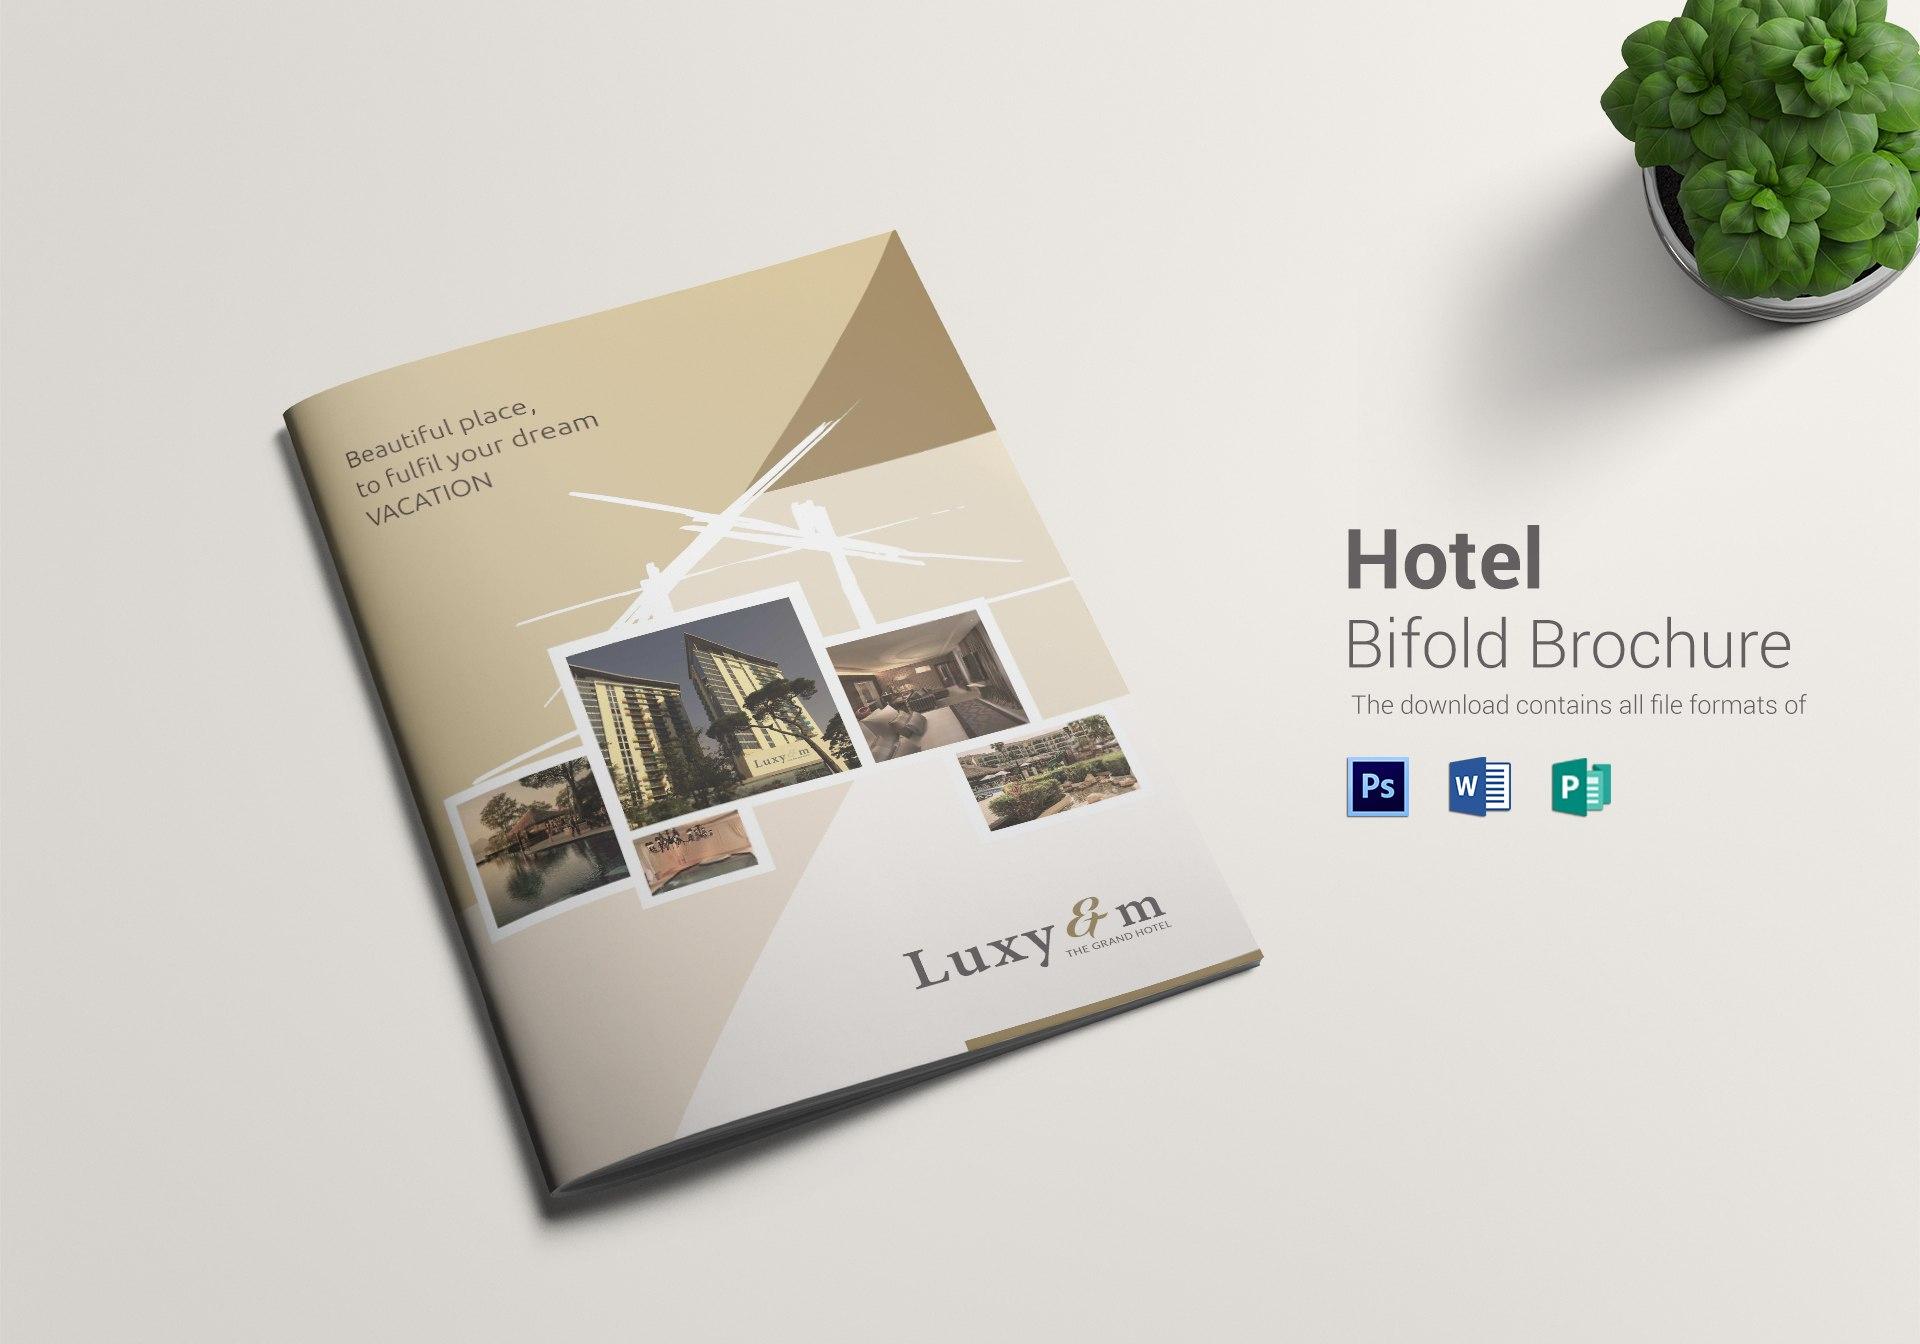 Hotel Bi Fold Brochure Design Template In Word Psd Publisher With Hotel Brochure Design Templates